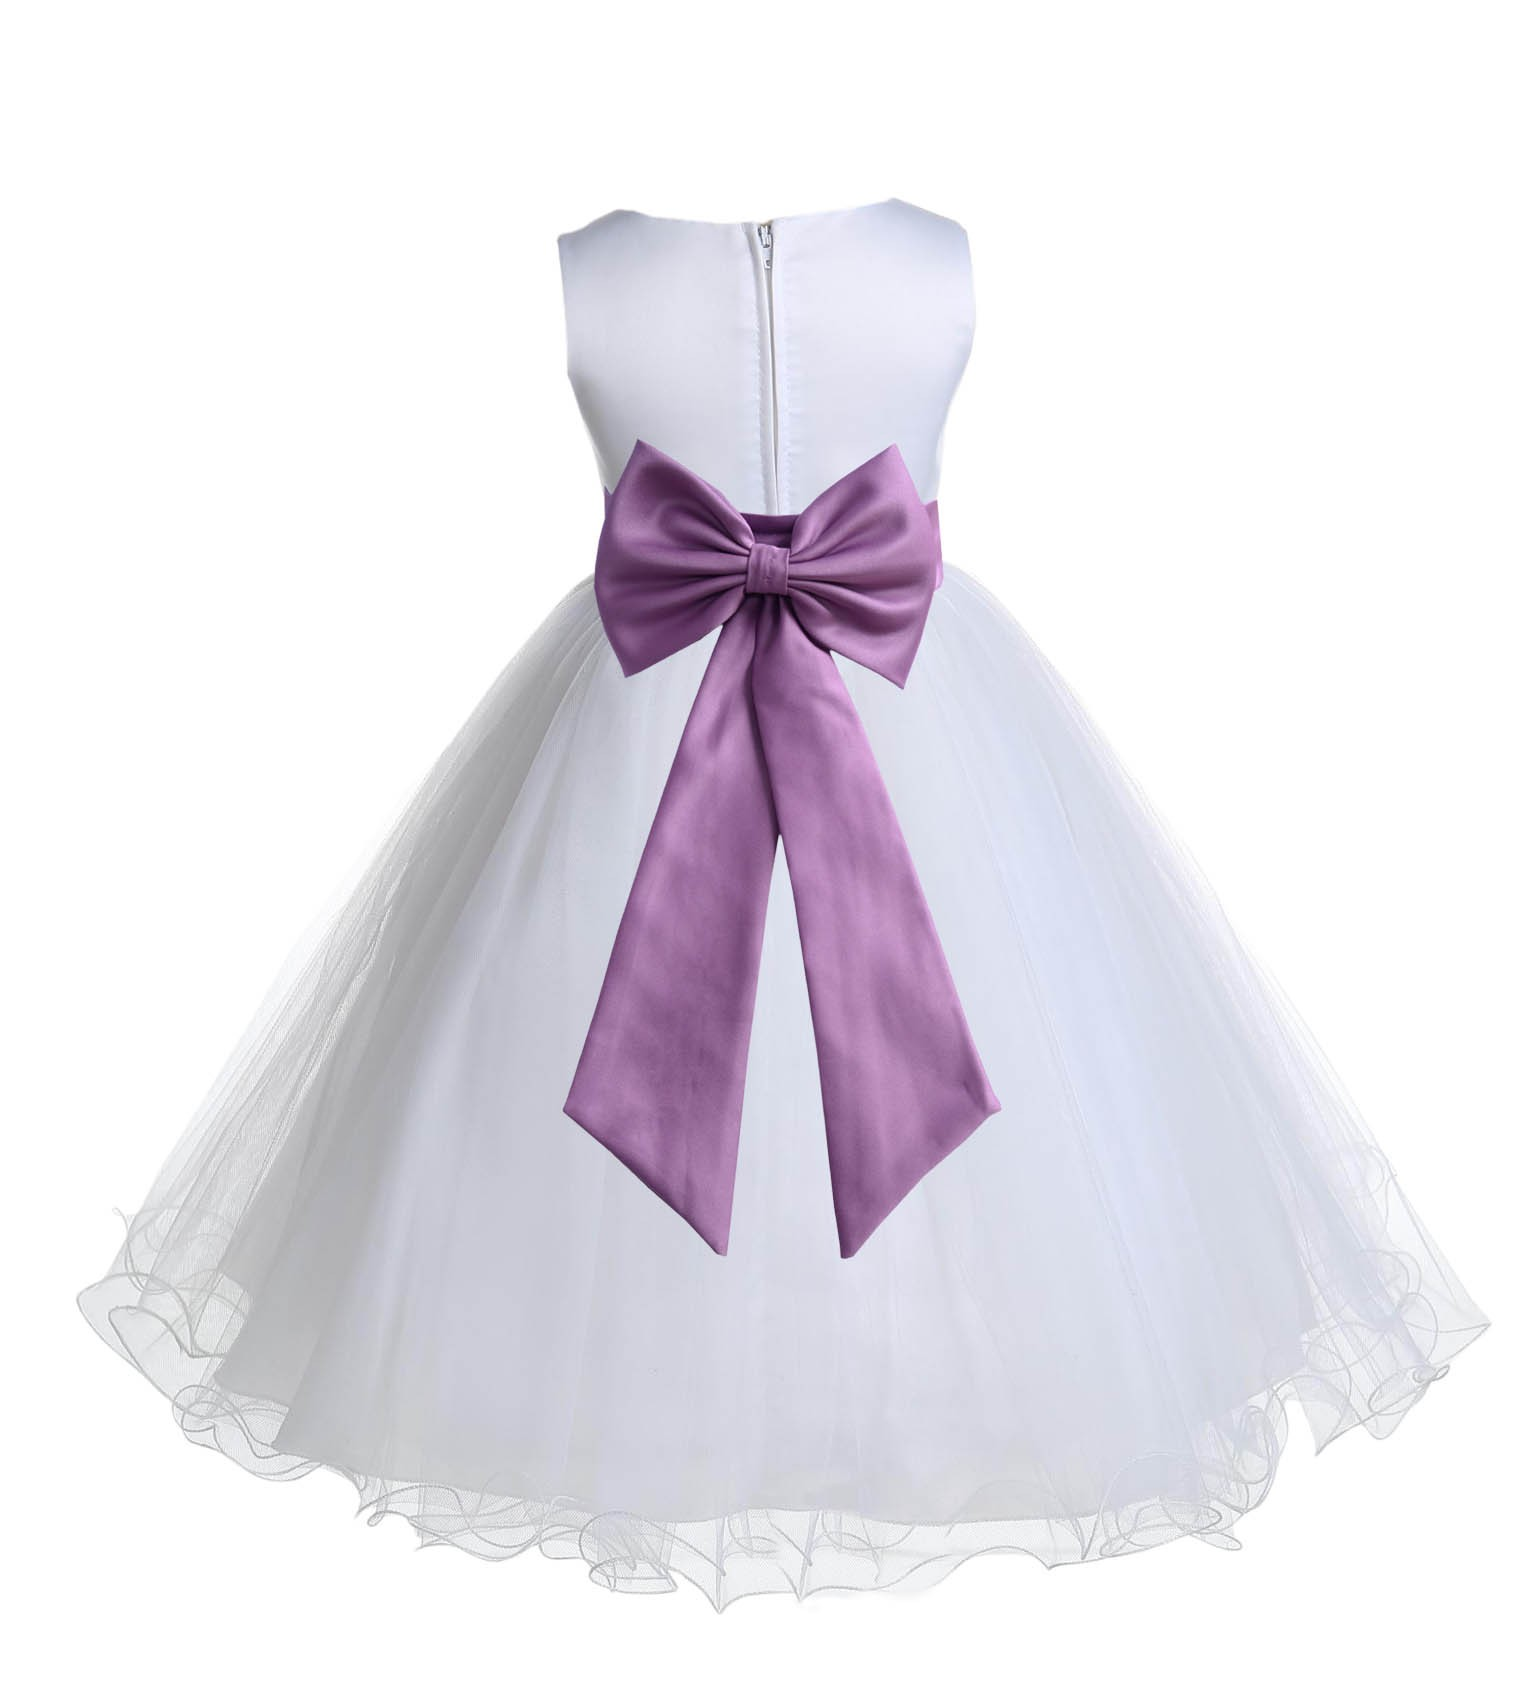 b9434036a34 White Wisteria Tulle Rattail Edge Flower Girl Dress Wedding Bridesmaid 829T